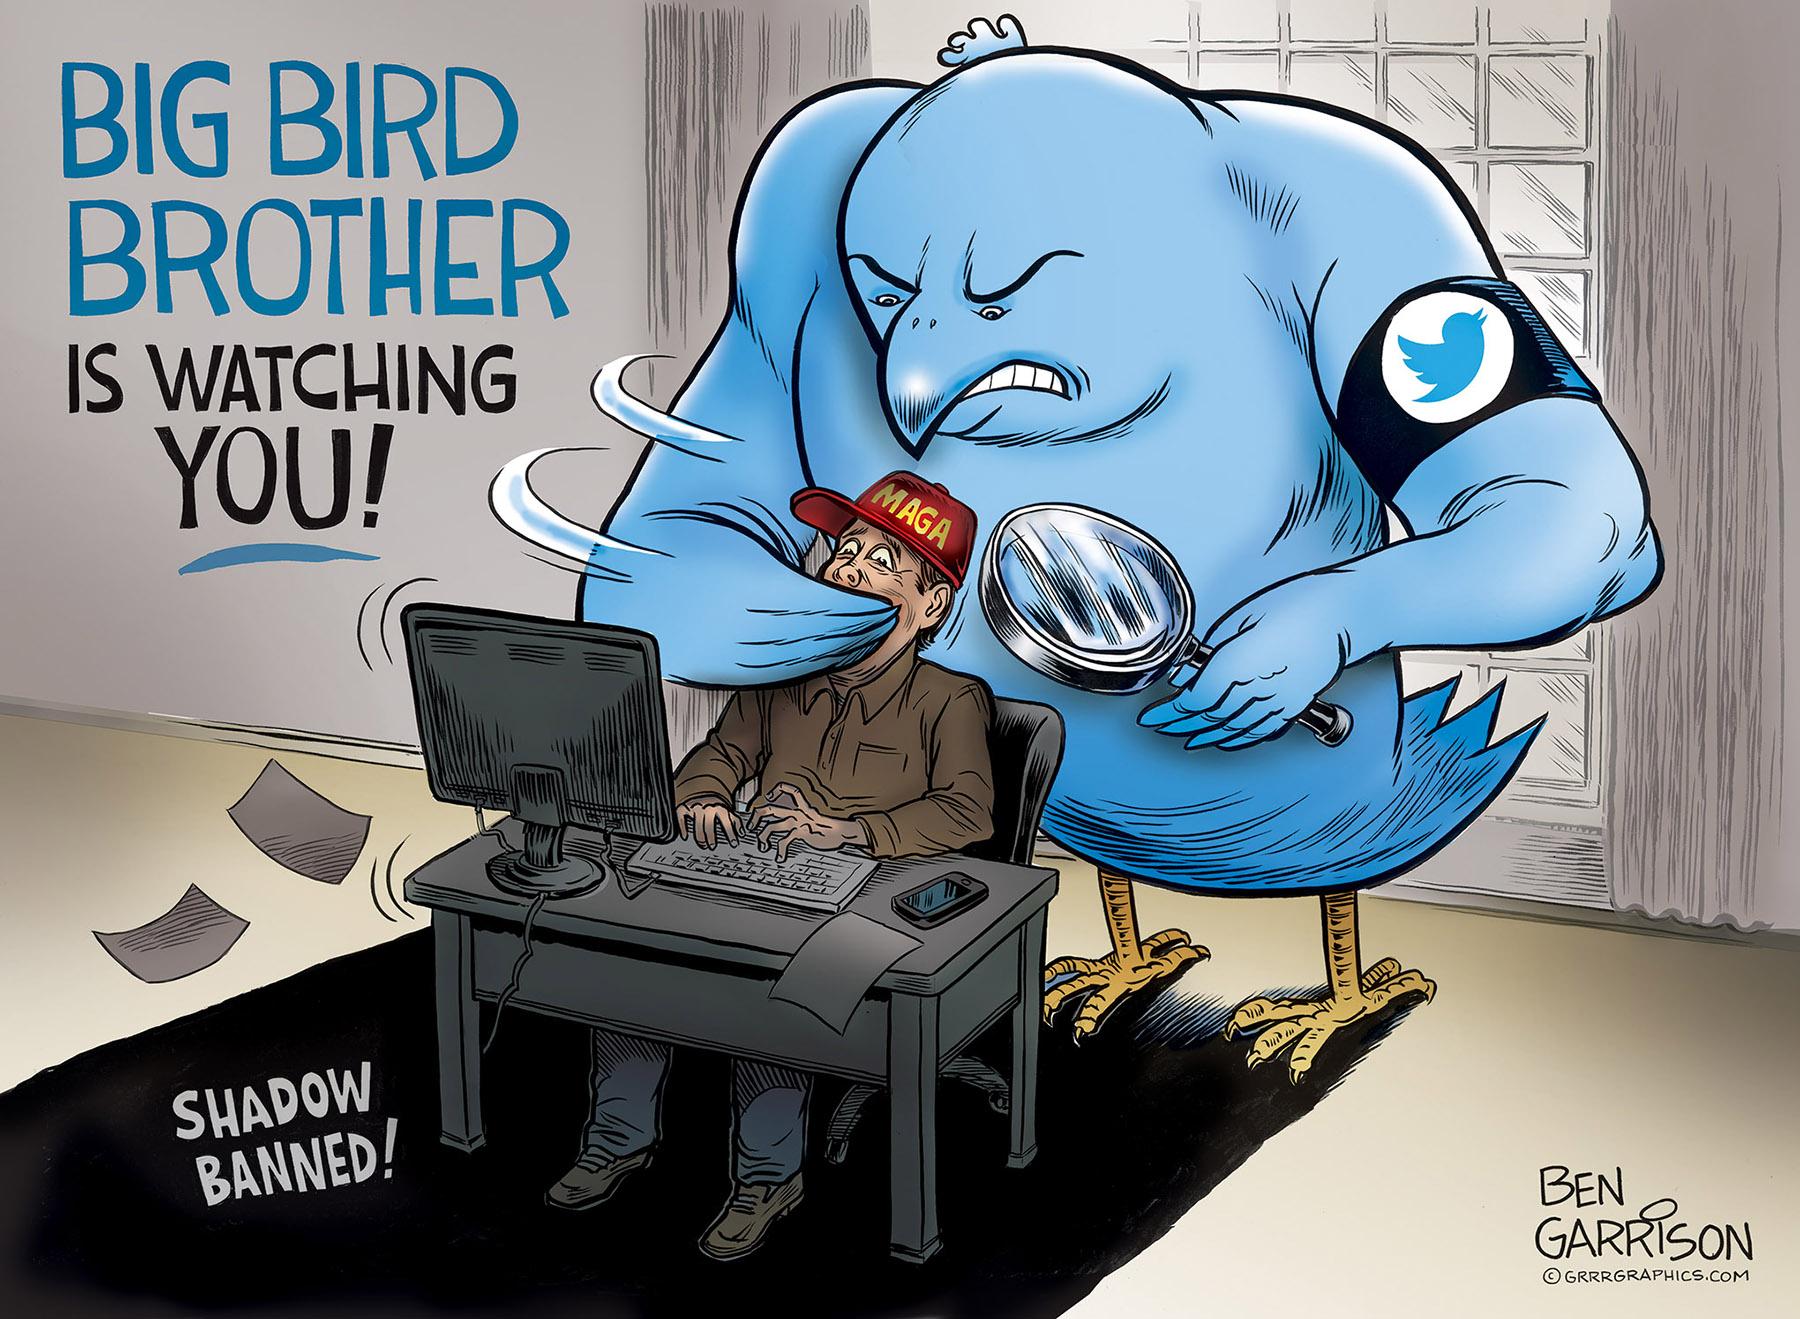 Twitter is Big Bird Brother